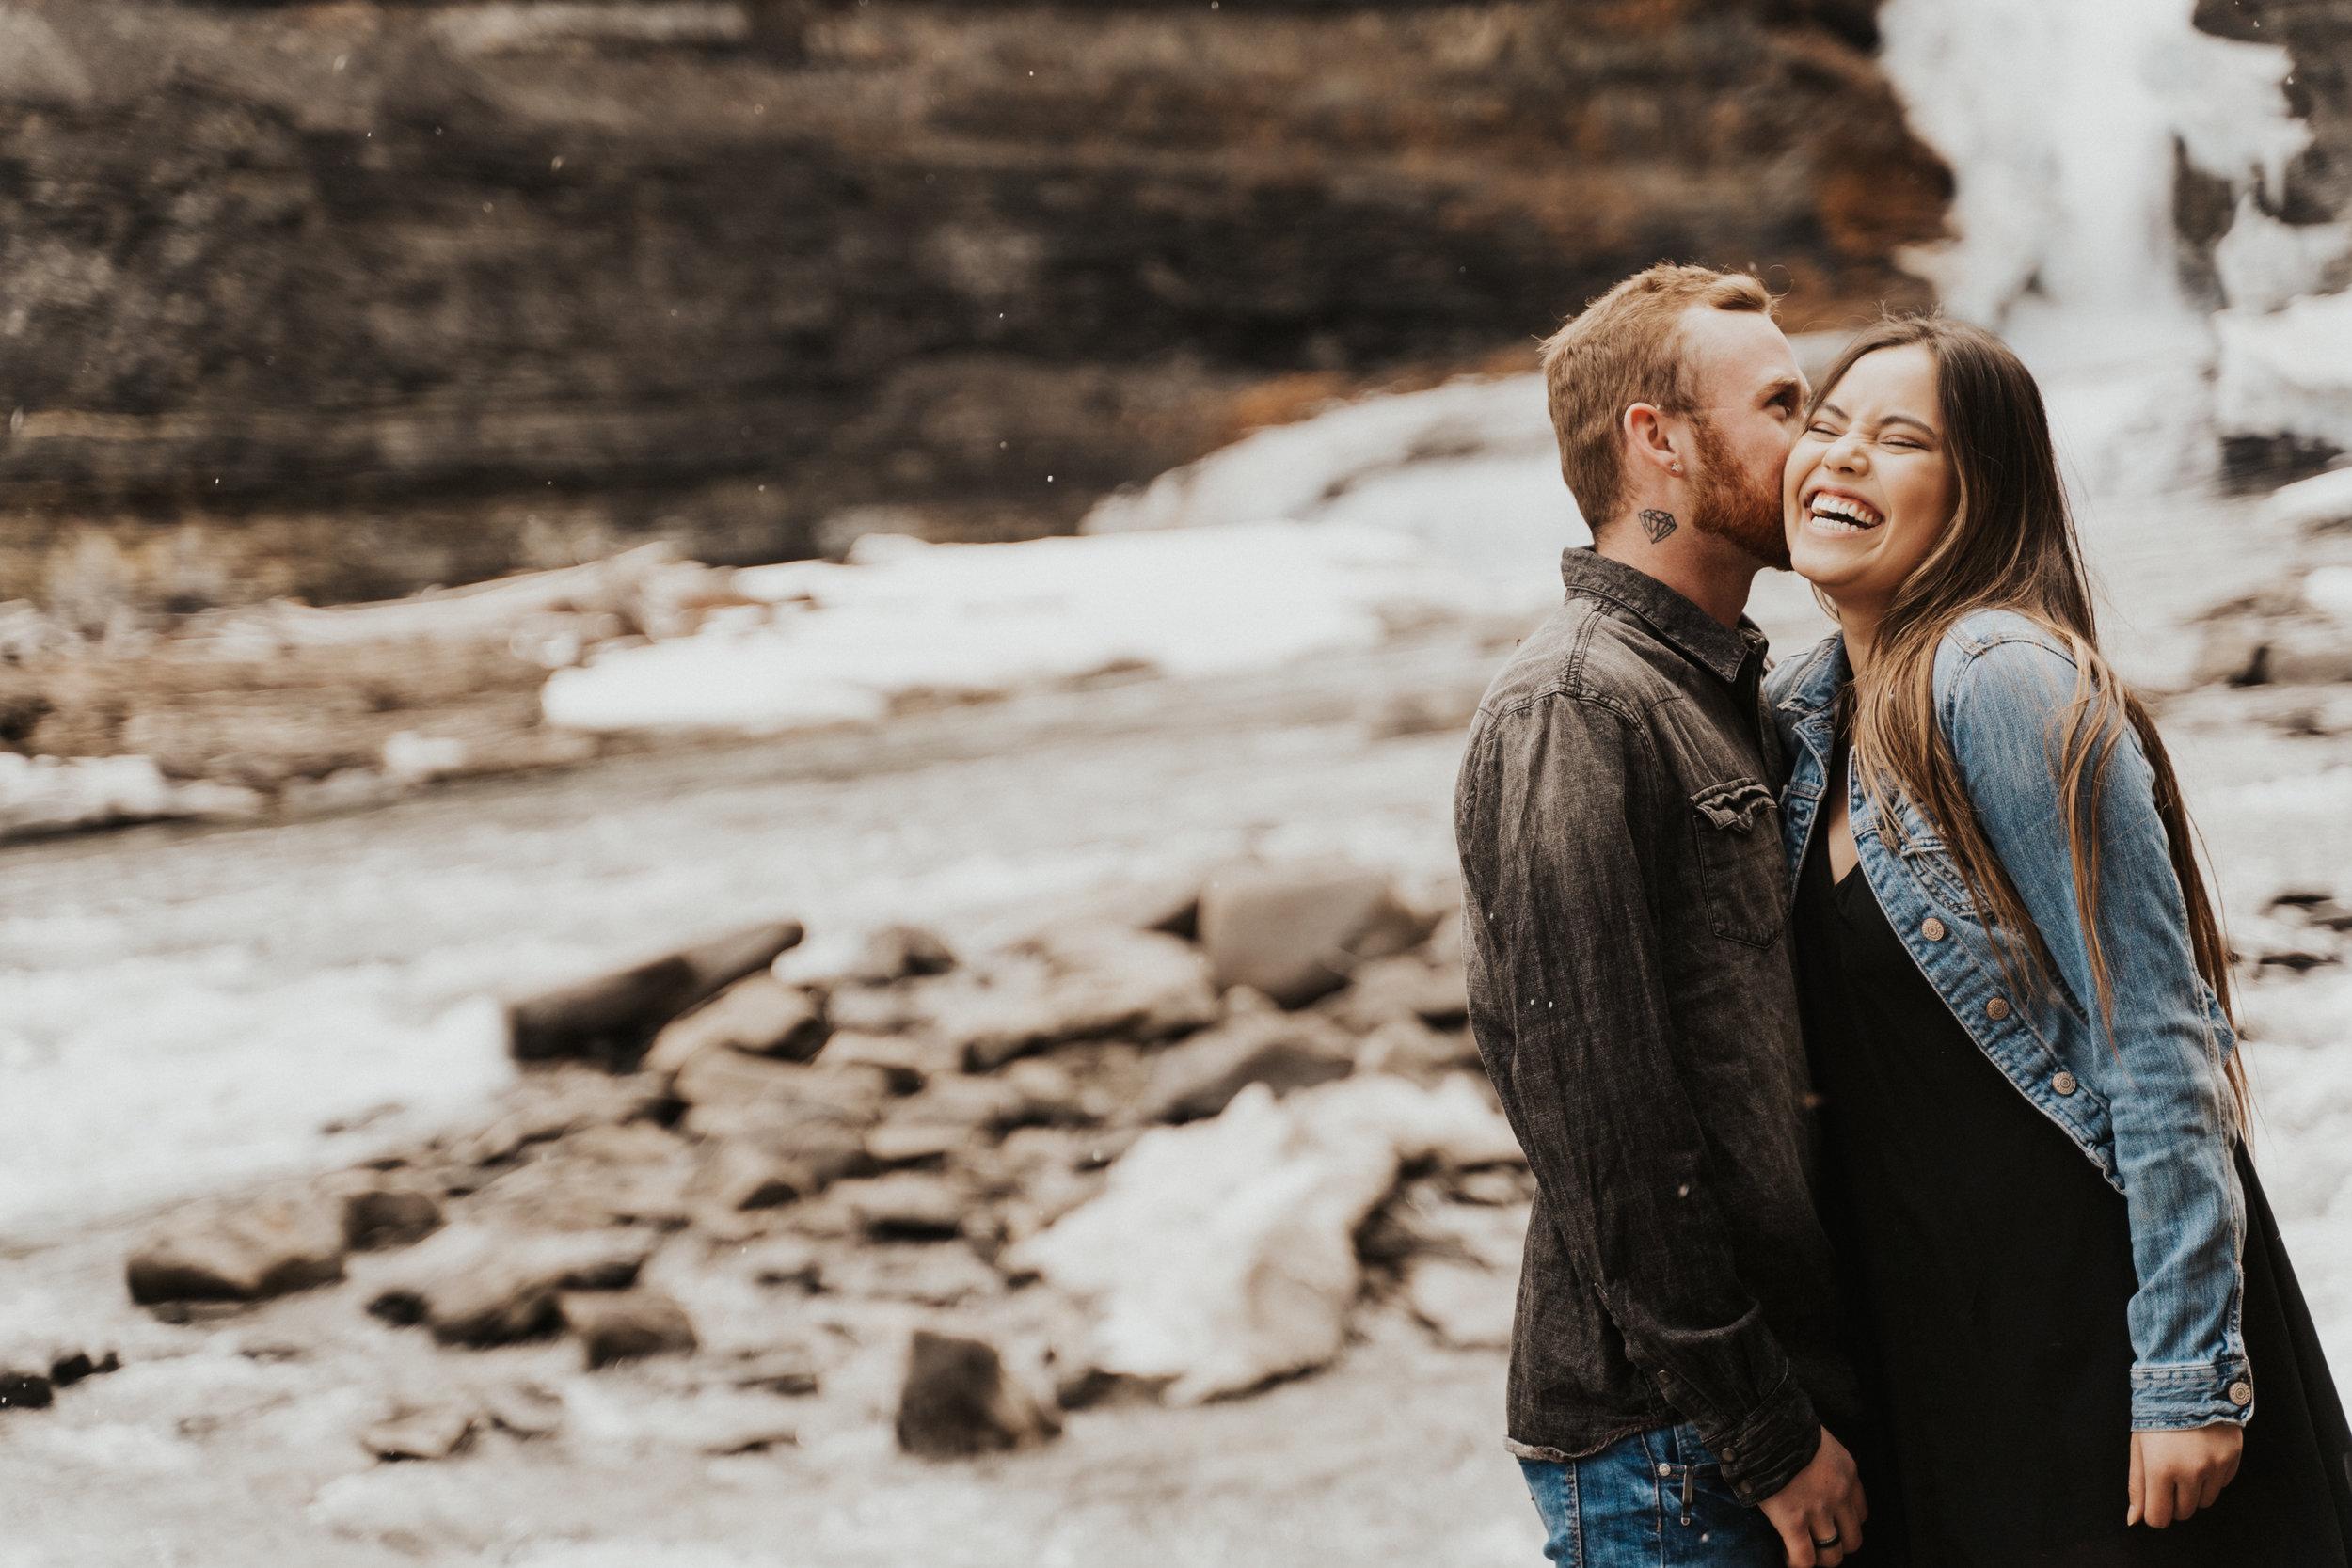 tyraephotography_photographer_wedding_elopement_engagement_photography-04301.jpg